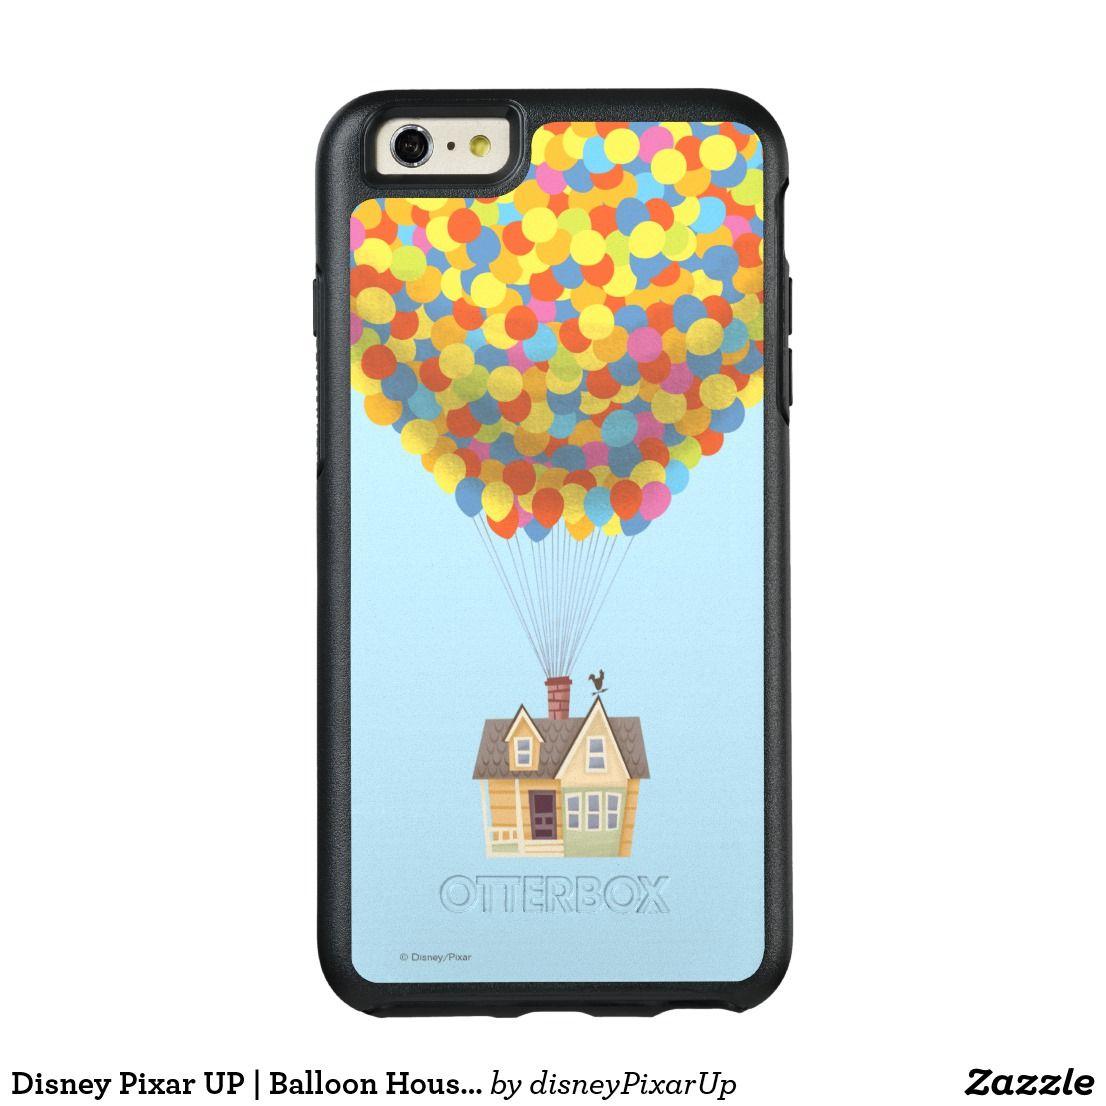 Disney Pixar Up Balloon House Pastel Otterbox Iphone Case Zazzle Com Disney Pixar Up Iphone Cases Otterbox Disney Up